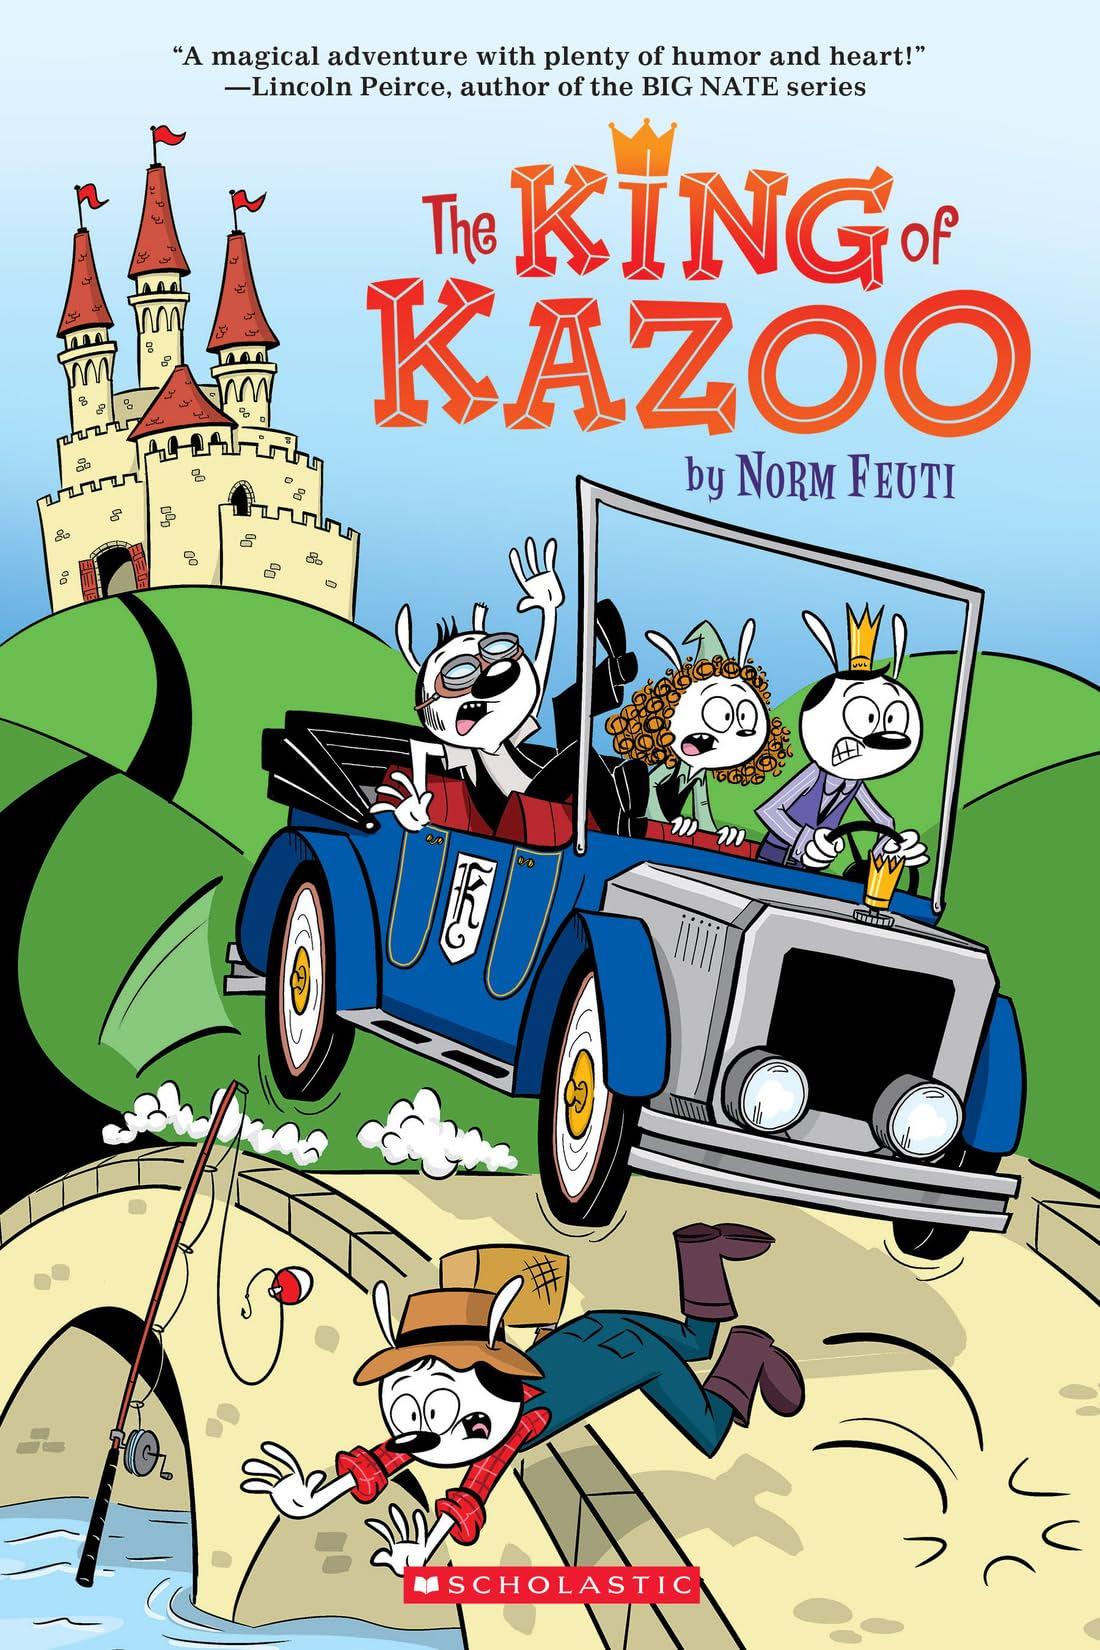 The King of Kazoo Vol. 1